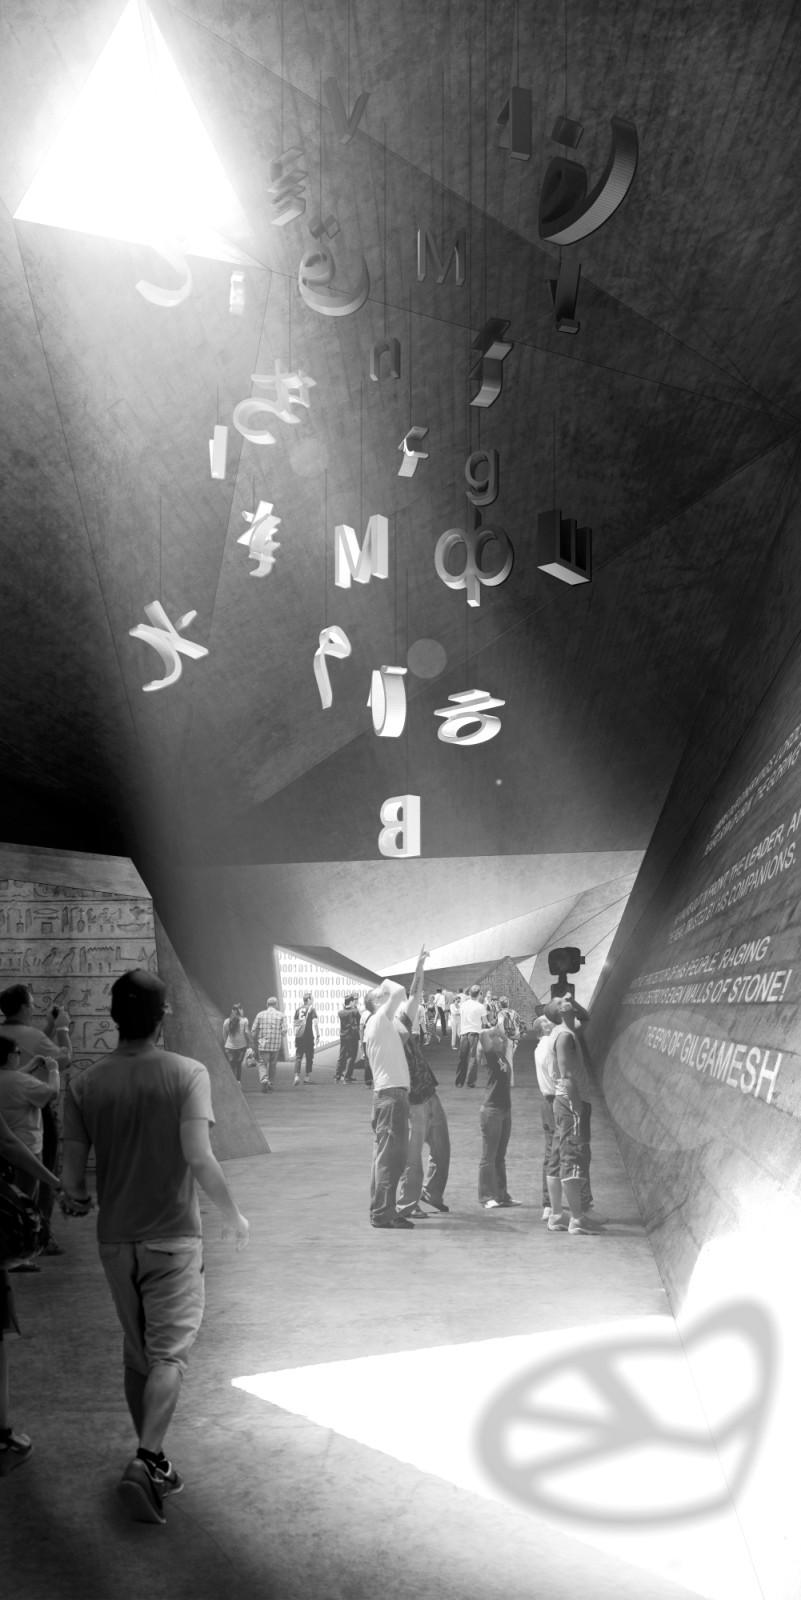 National Museum of World Writing